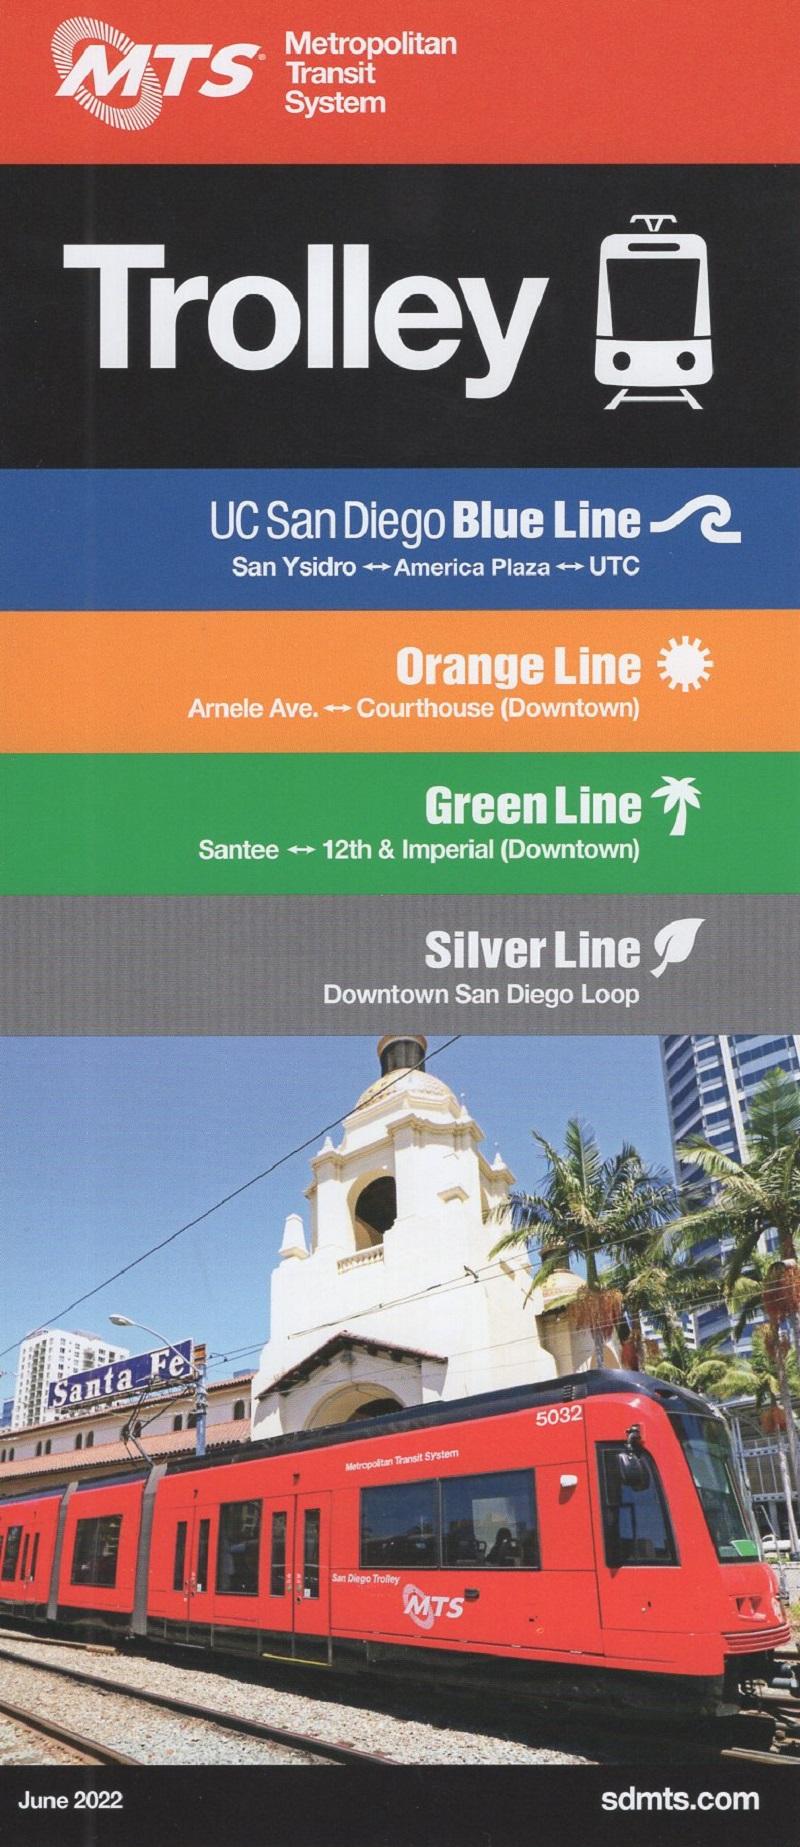 San Diego Metropolitan Transit - Trolley System